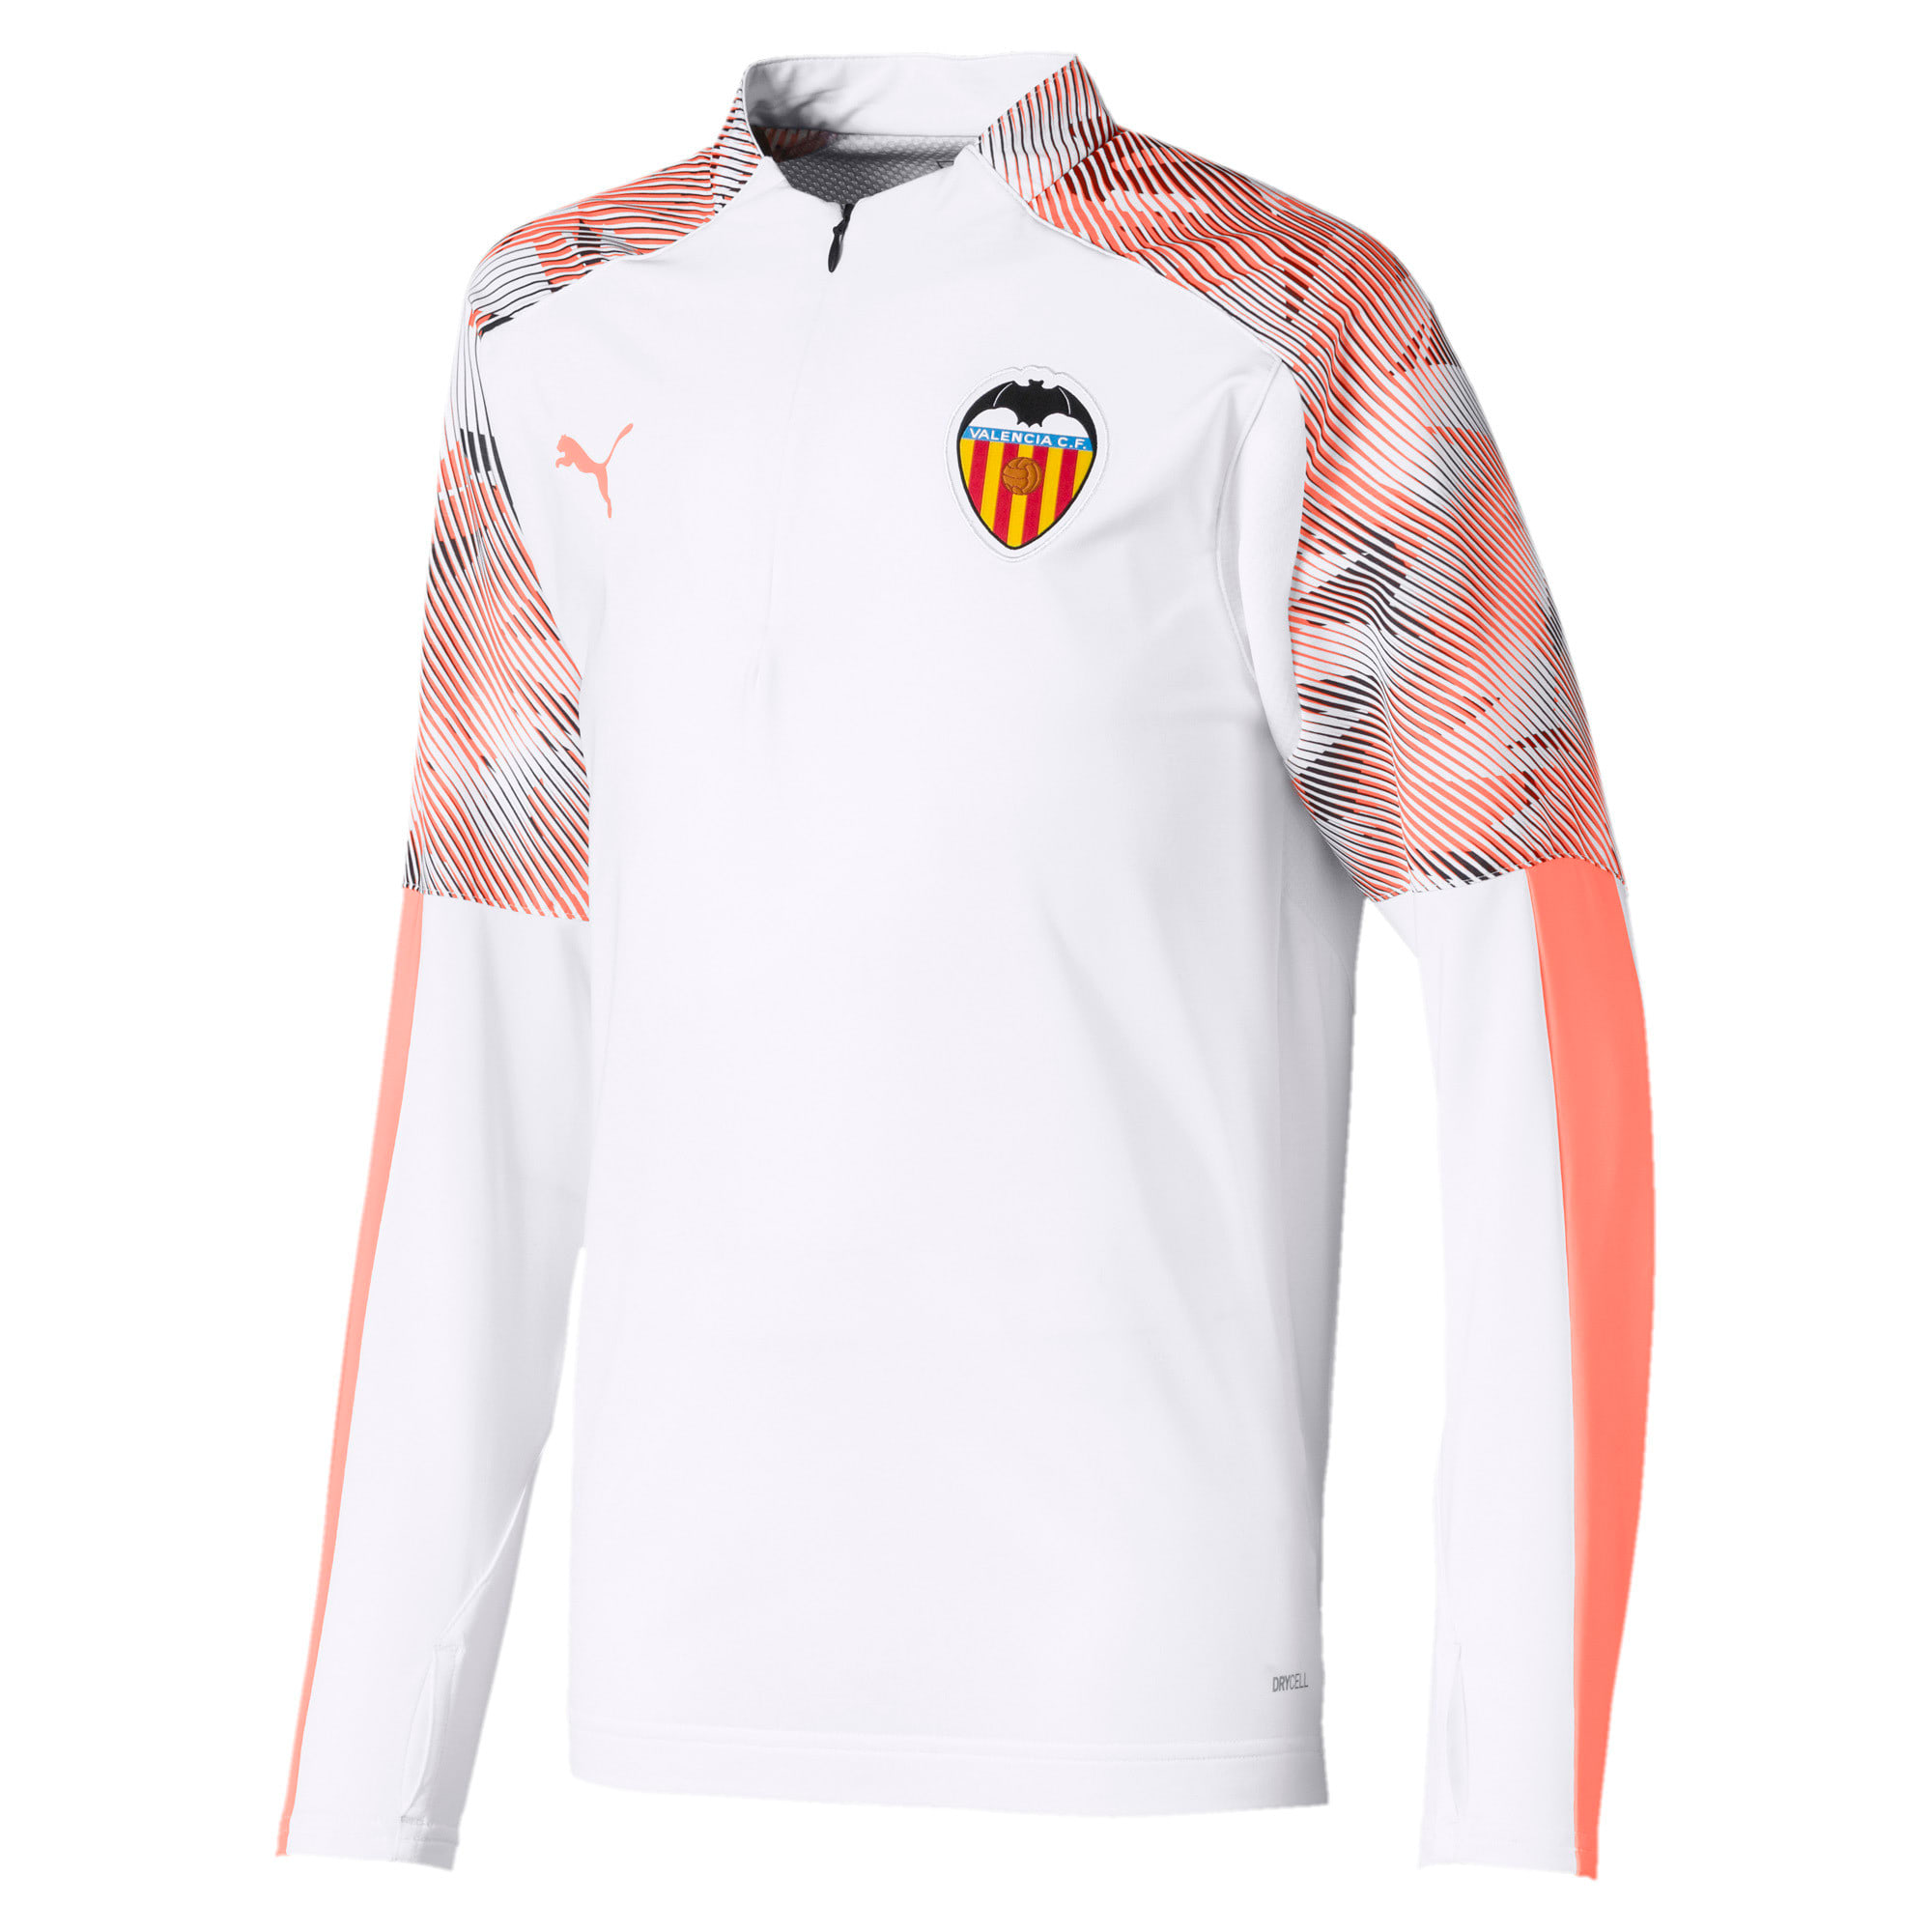 Imagen en miniatura 1 de Camiseta de training con media cremallera de niño Valencia CF, Puma White-Fizzy Orange, mediana